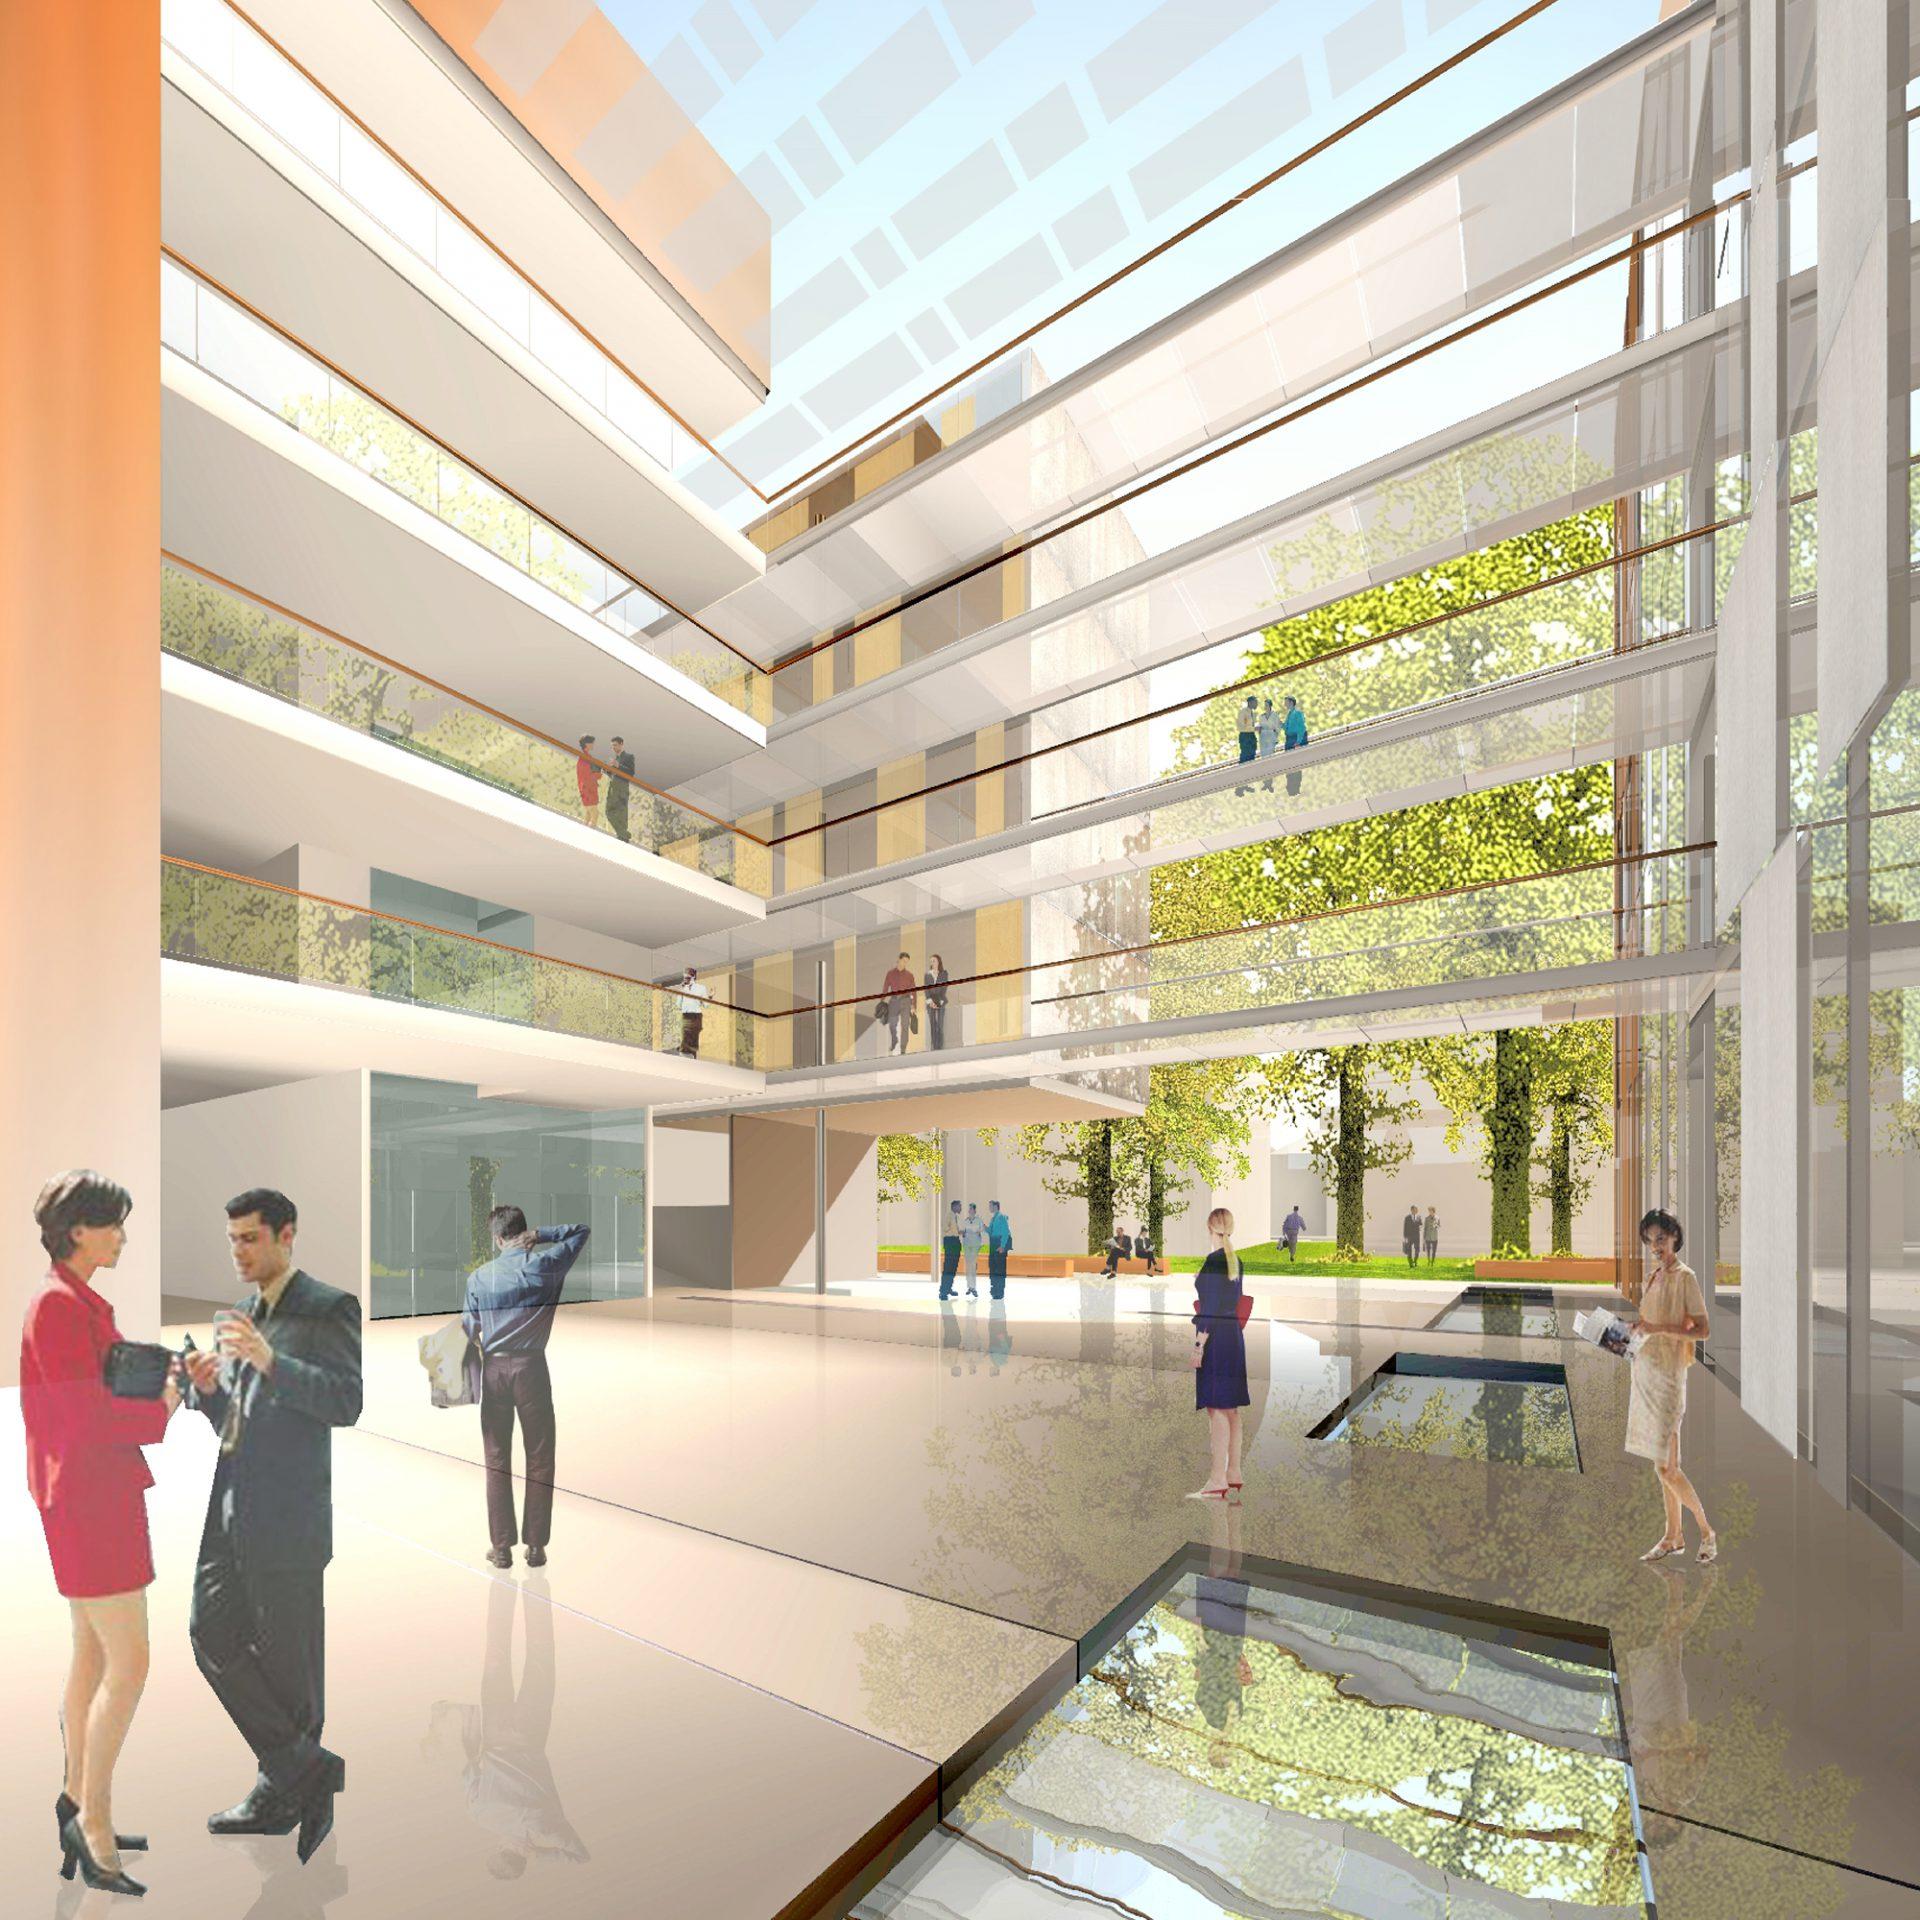 Bürogebäude KfW Frankfurt am Main